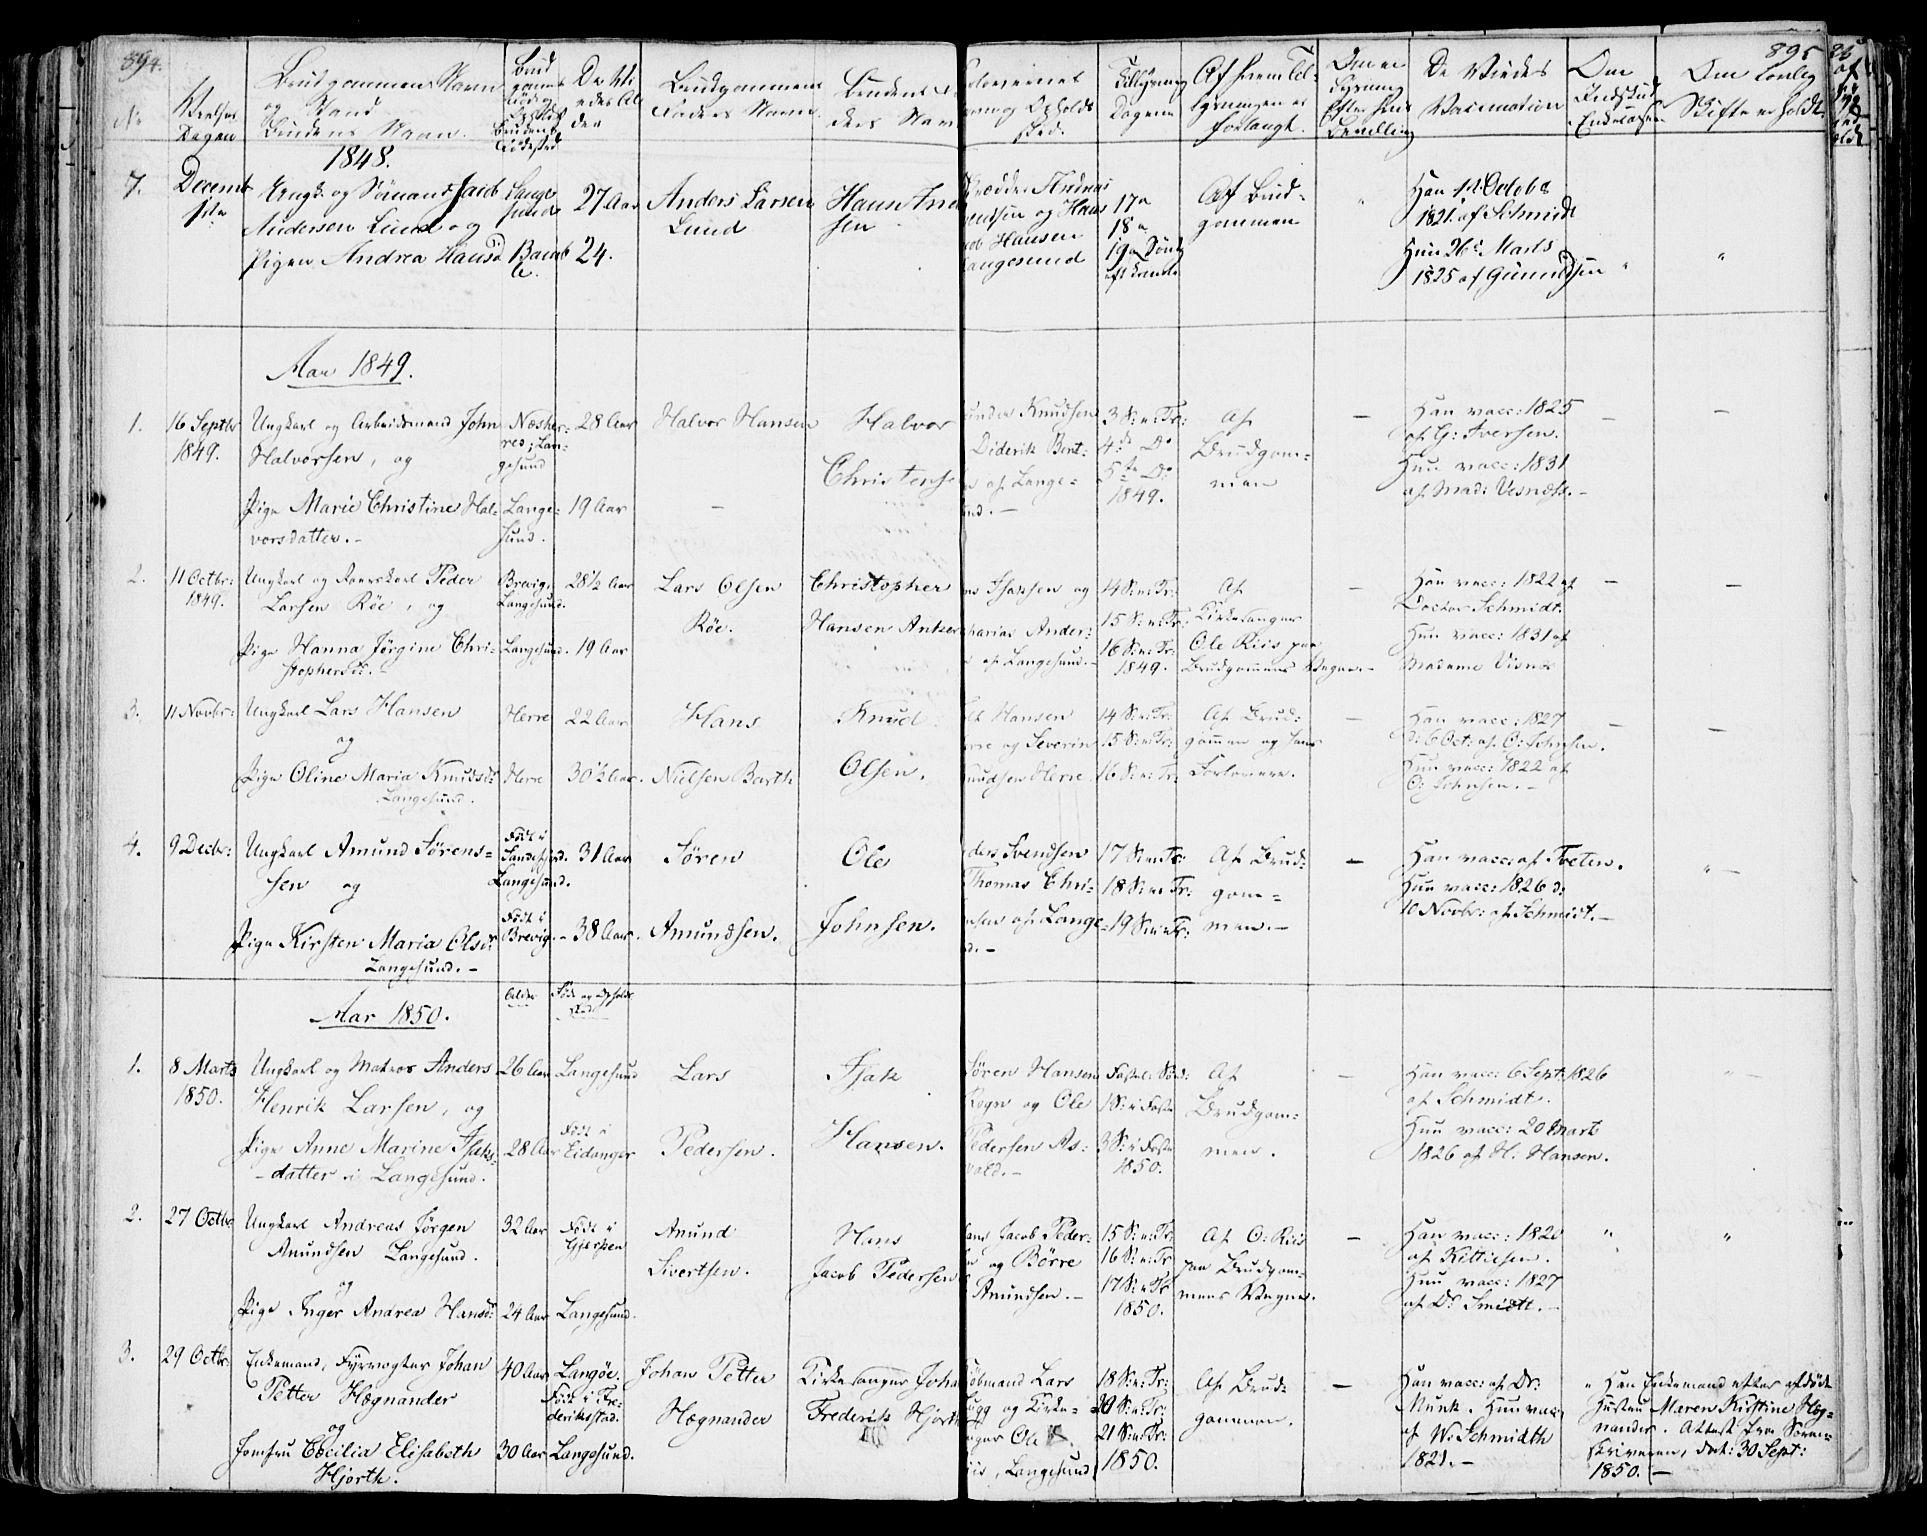 SAKO, Bamble kirkebøker, F/Fa/L0004: Ministerialbok nr. I 4, 1834-1853, s. 894-895